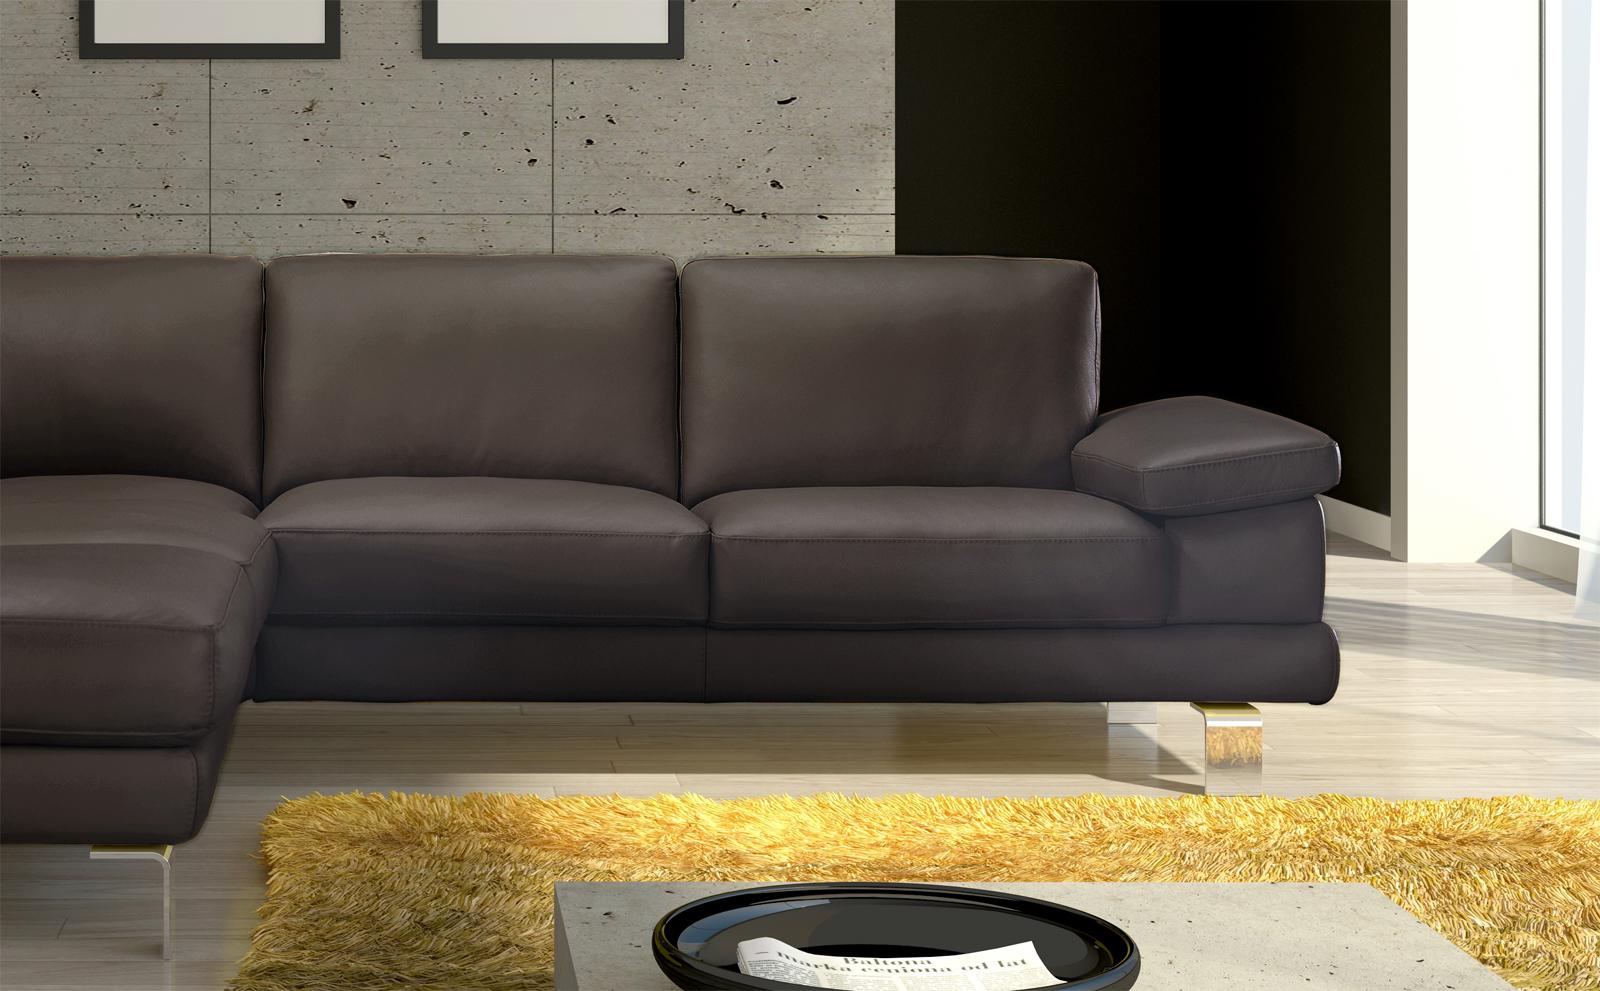 sale ecksofa braun polsterecke mezzo 220 x 270 cm. Black Bedroom Furniture Sets. Home Design Ideas